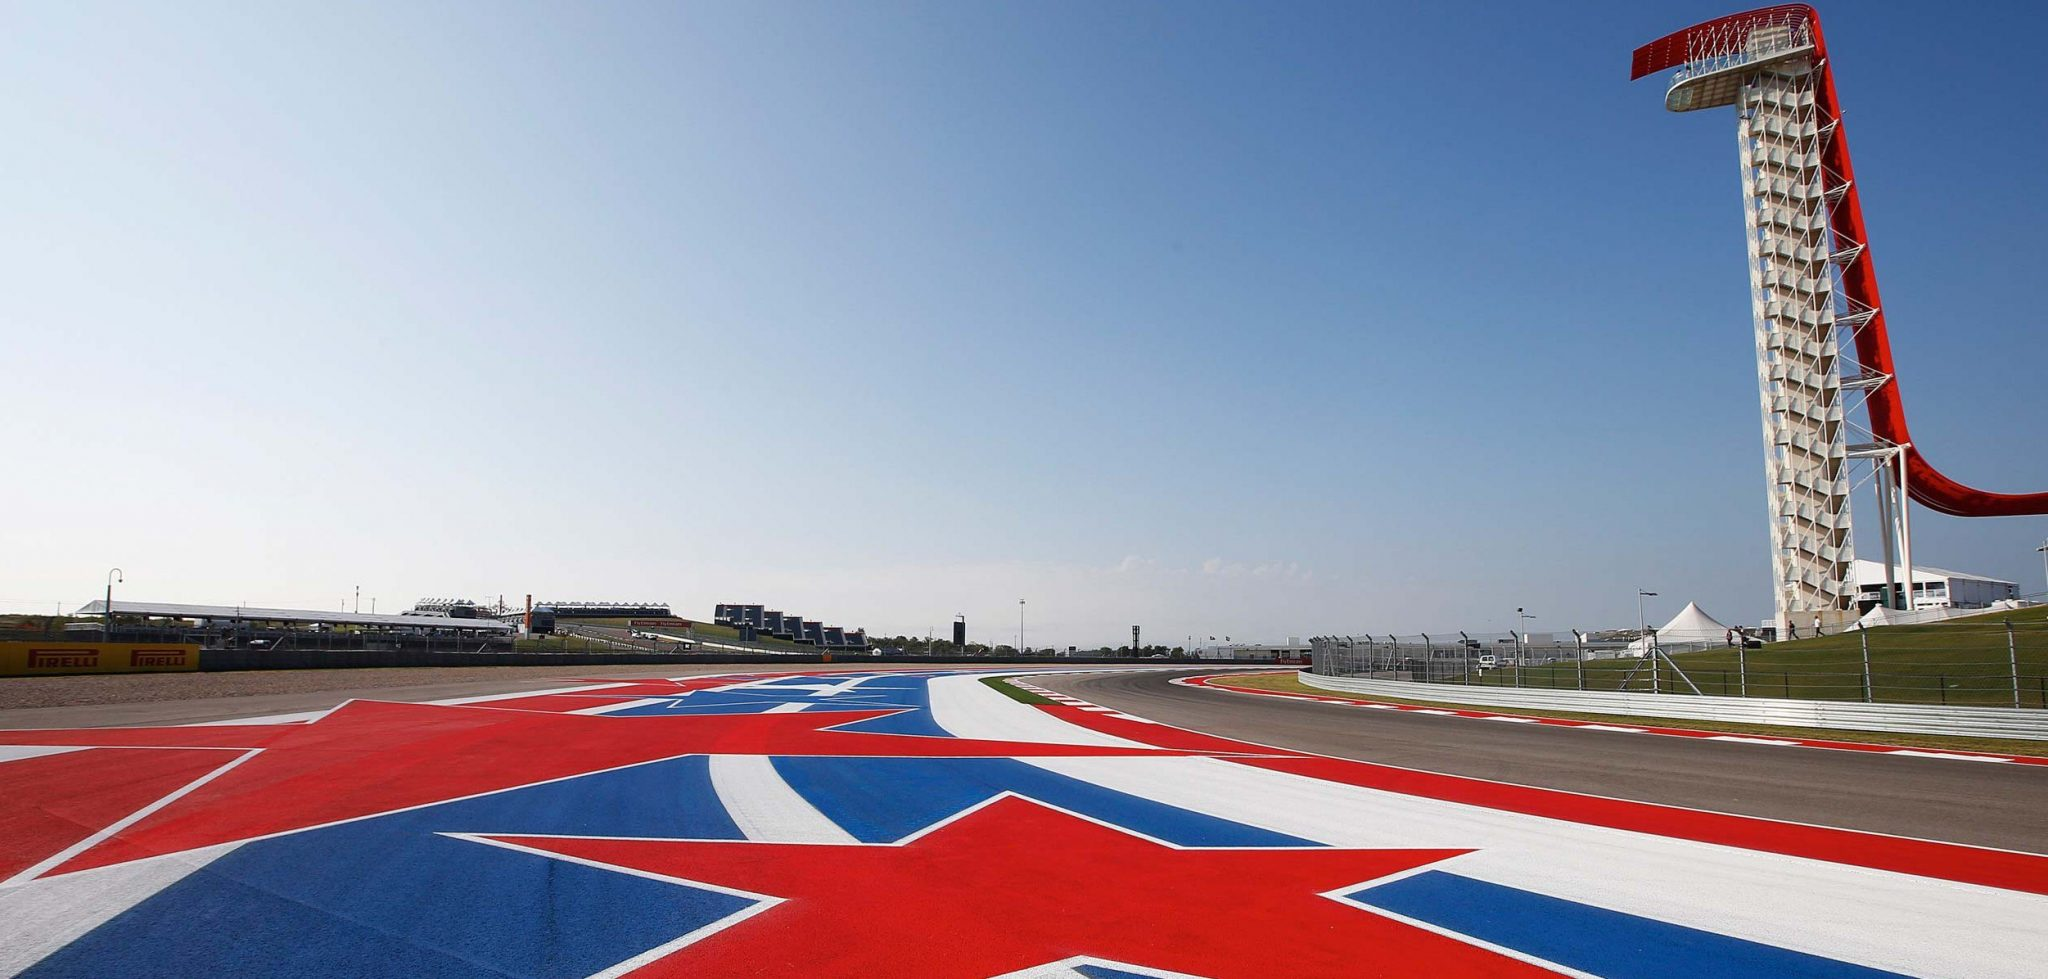 2018 United States Grand Prix Austin Circuit Of The